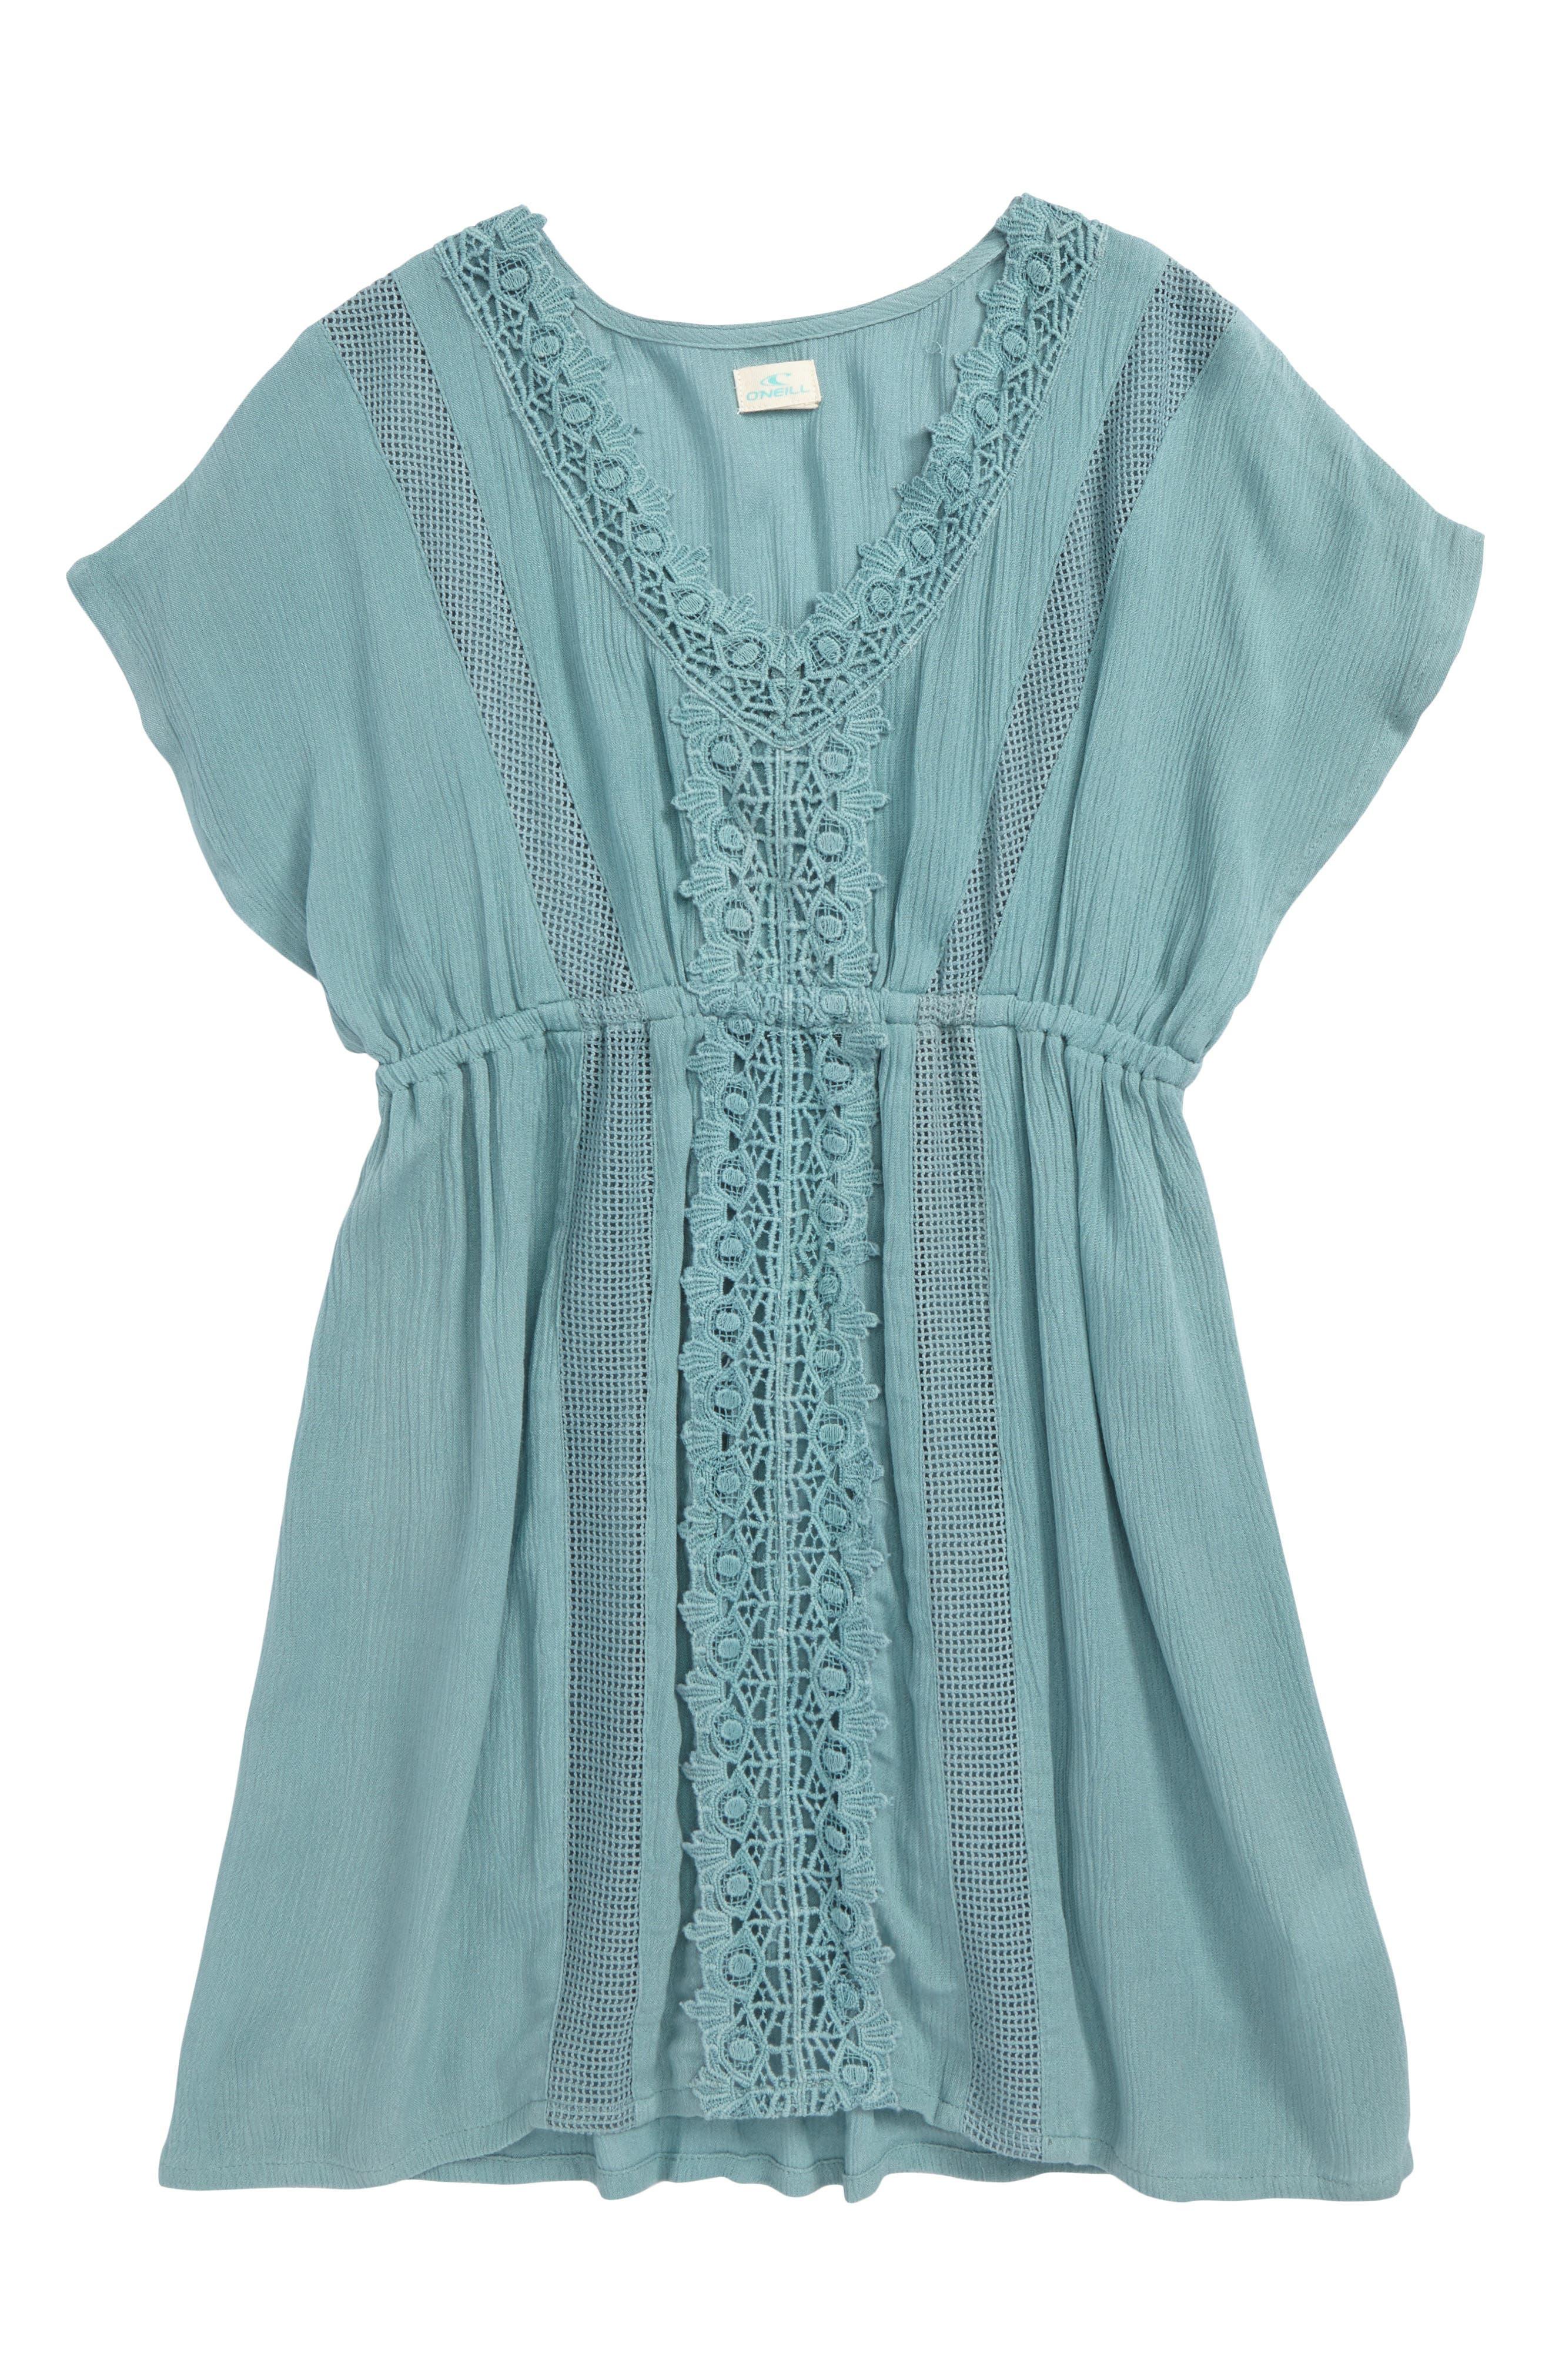 Main Image - O'Neill Kayla Crochet Cover-Up Dress (Big Girls)